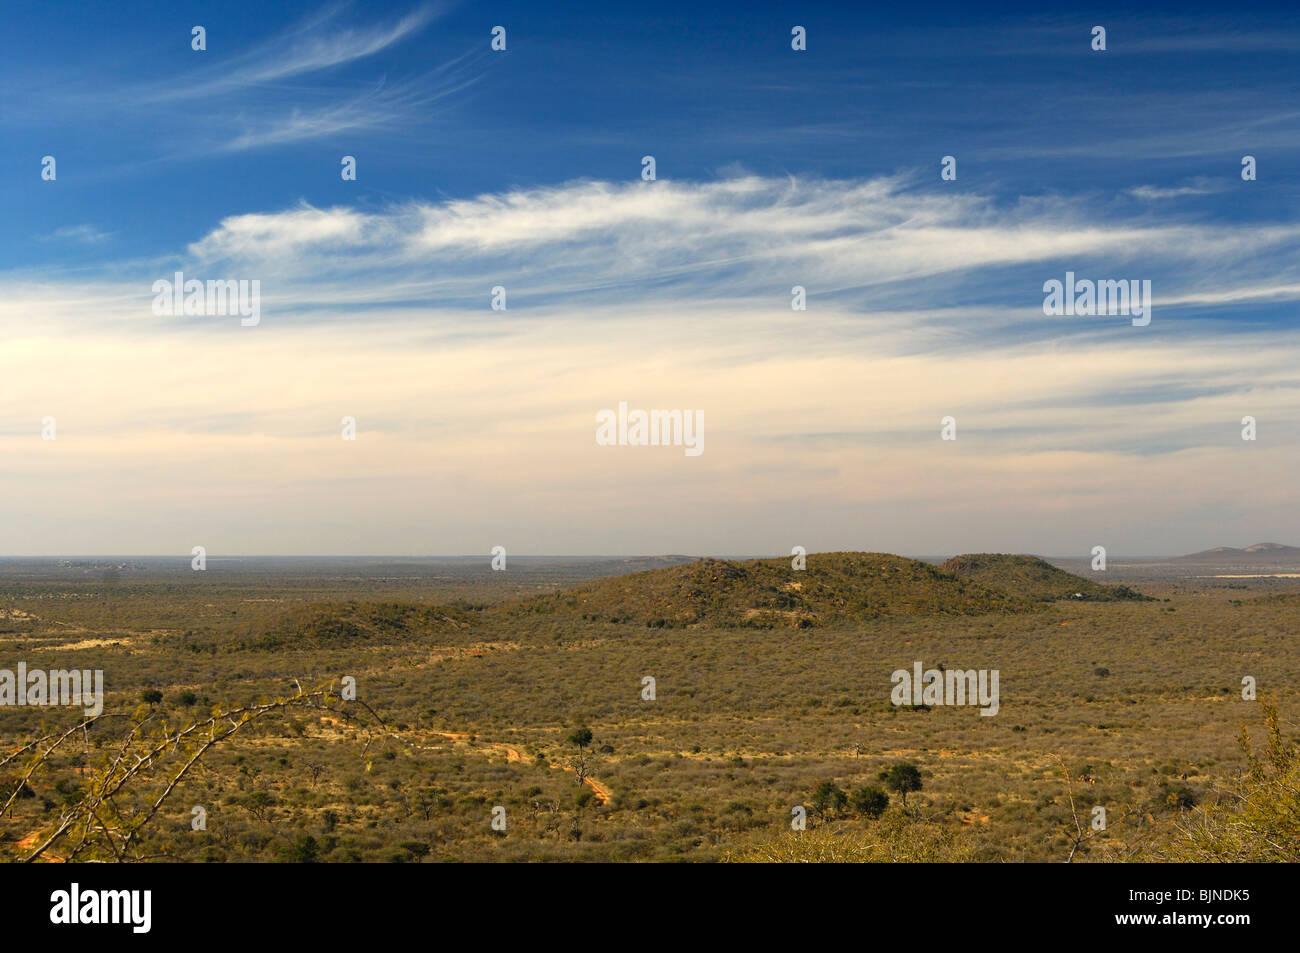 Vue sur le vaste paysage de savane africaine du Madikwe Game Reserve, Afrique du Sud Photo Stock